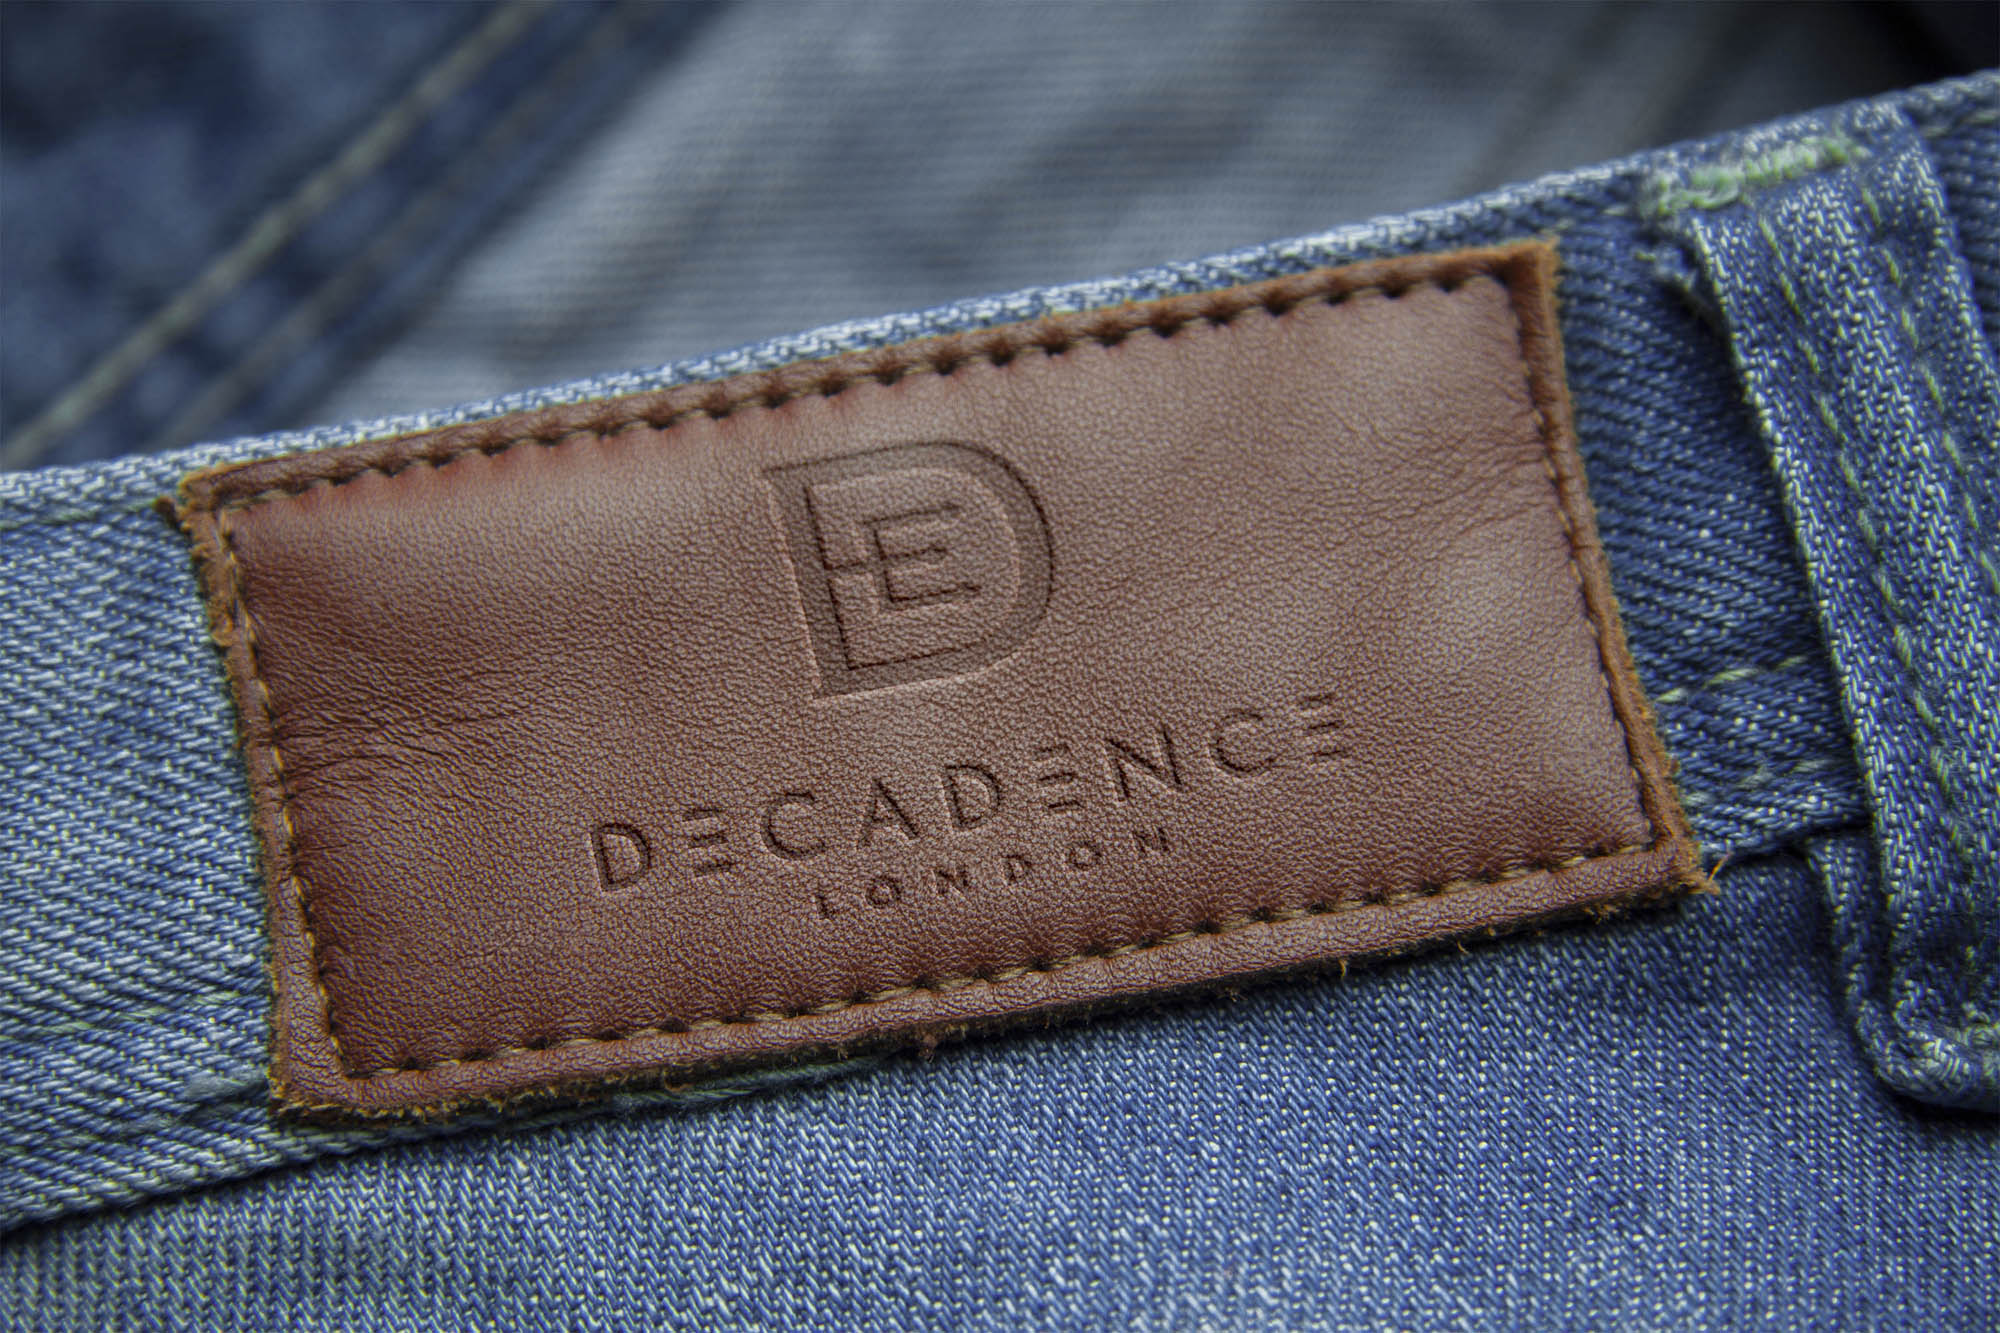 luxury-high-end-clothing-brand-logo-design-london09